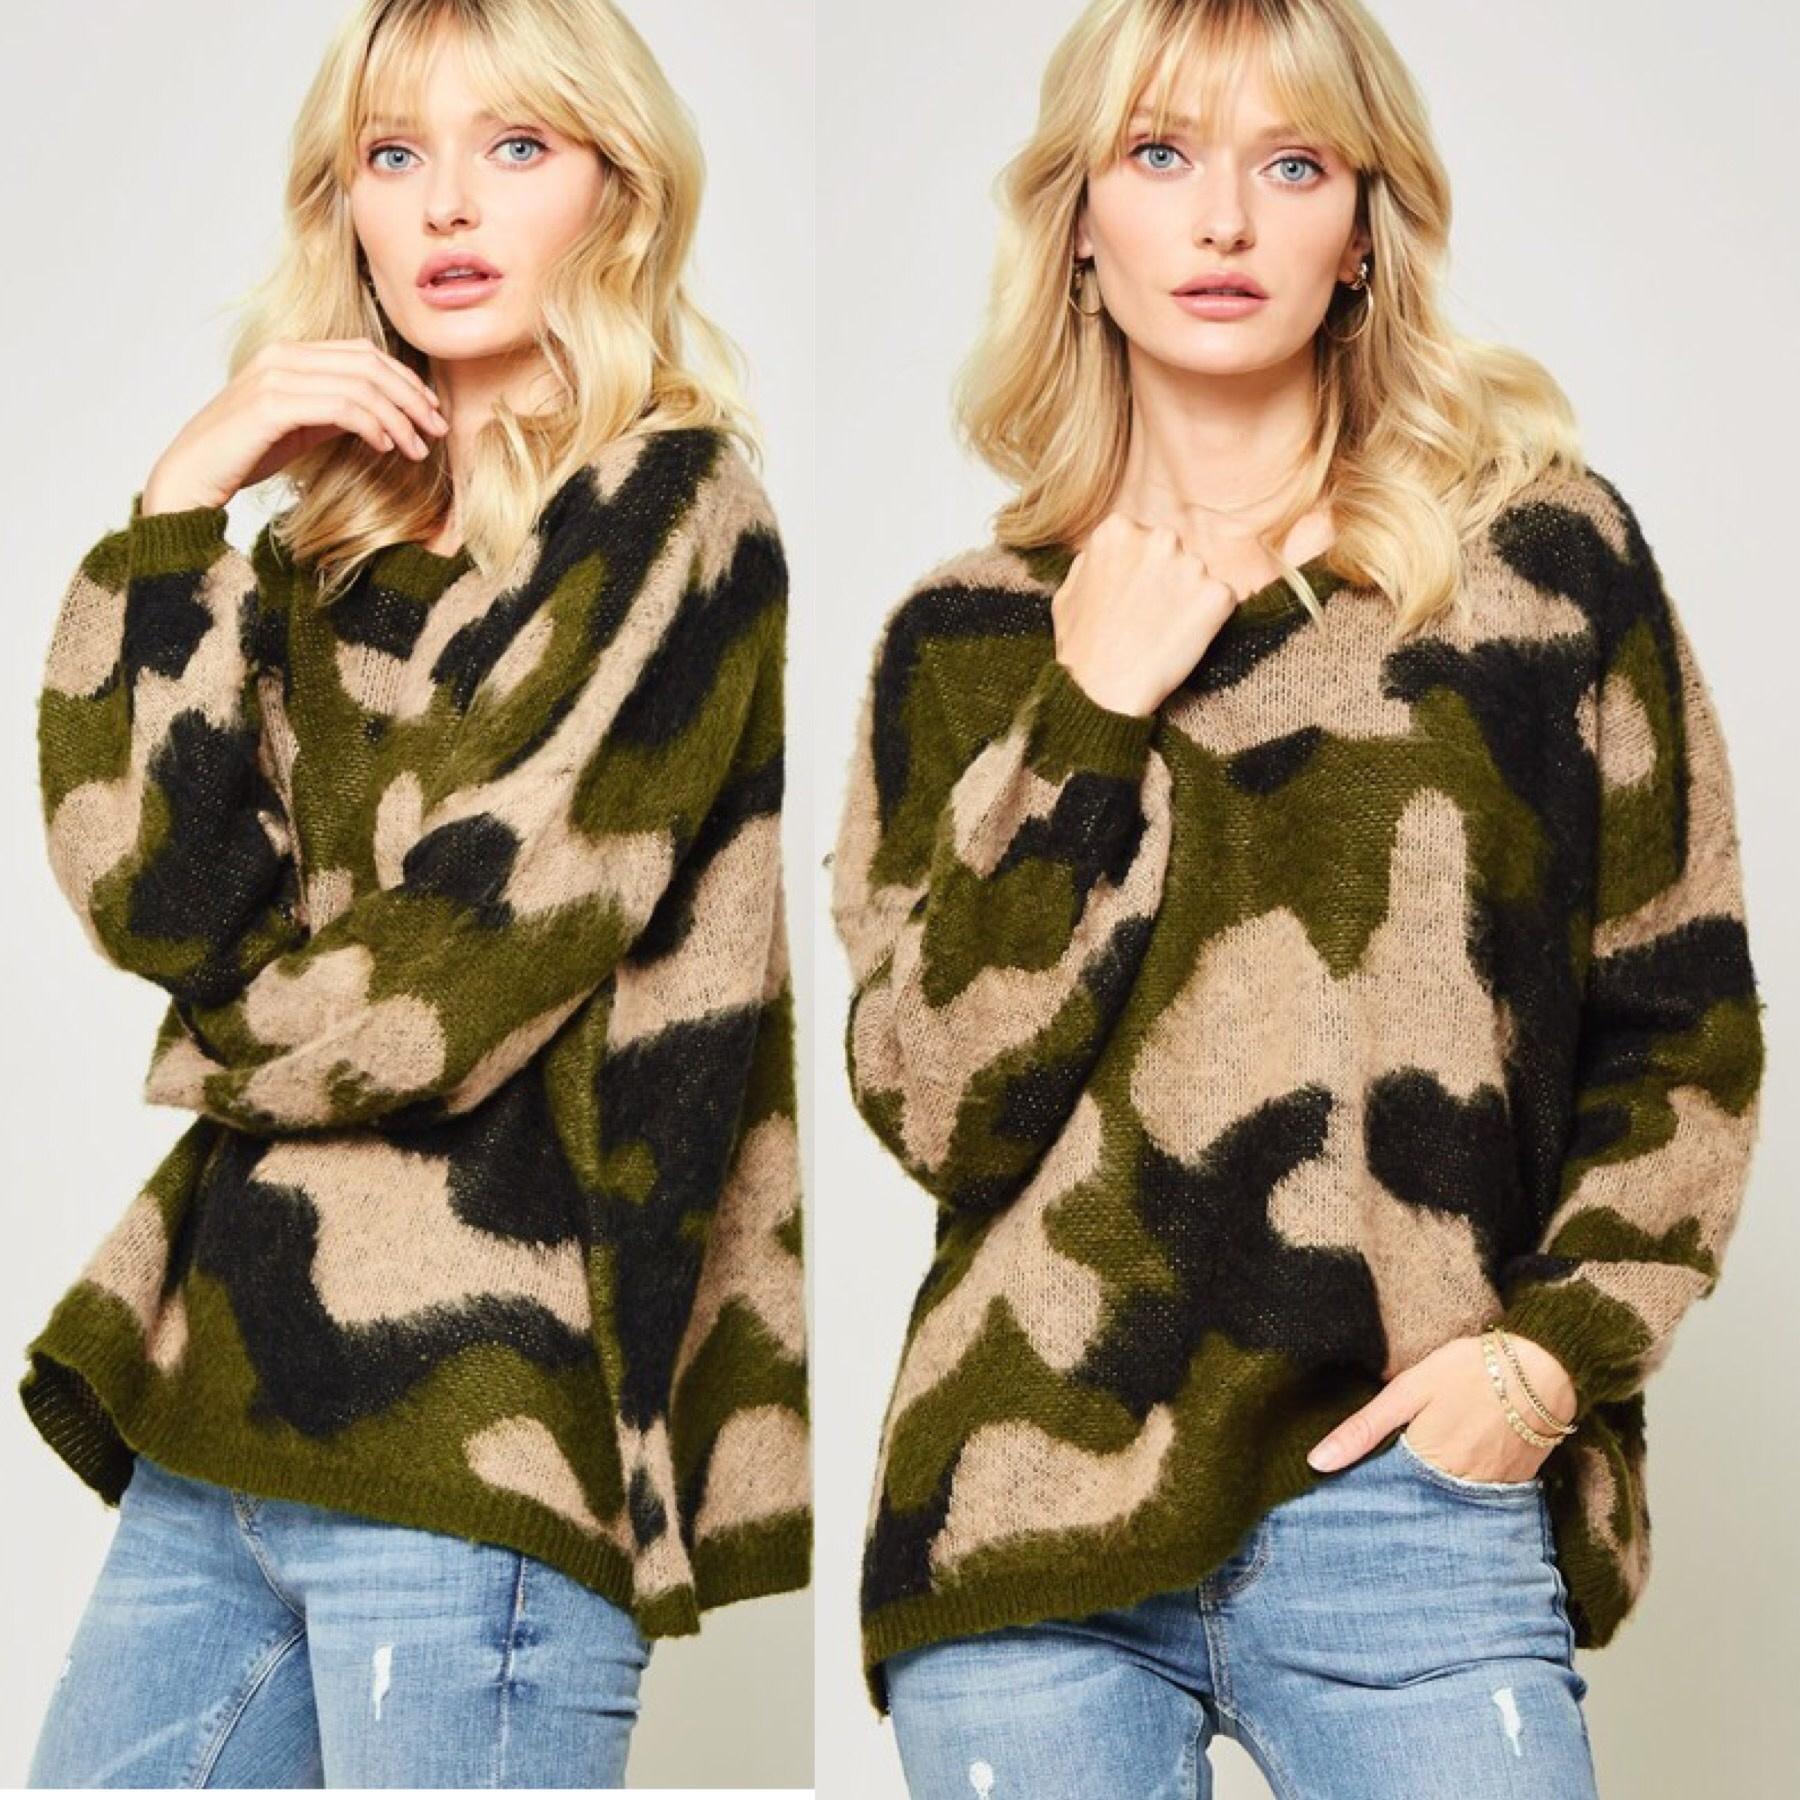 Camouflage Fuzzy Sweater